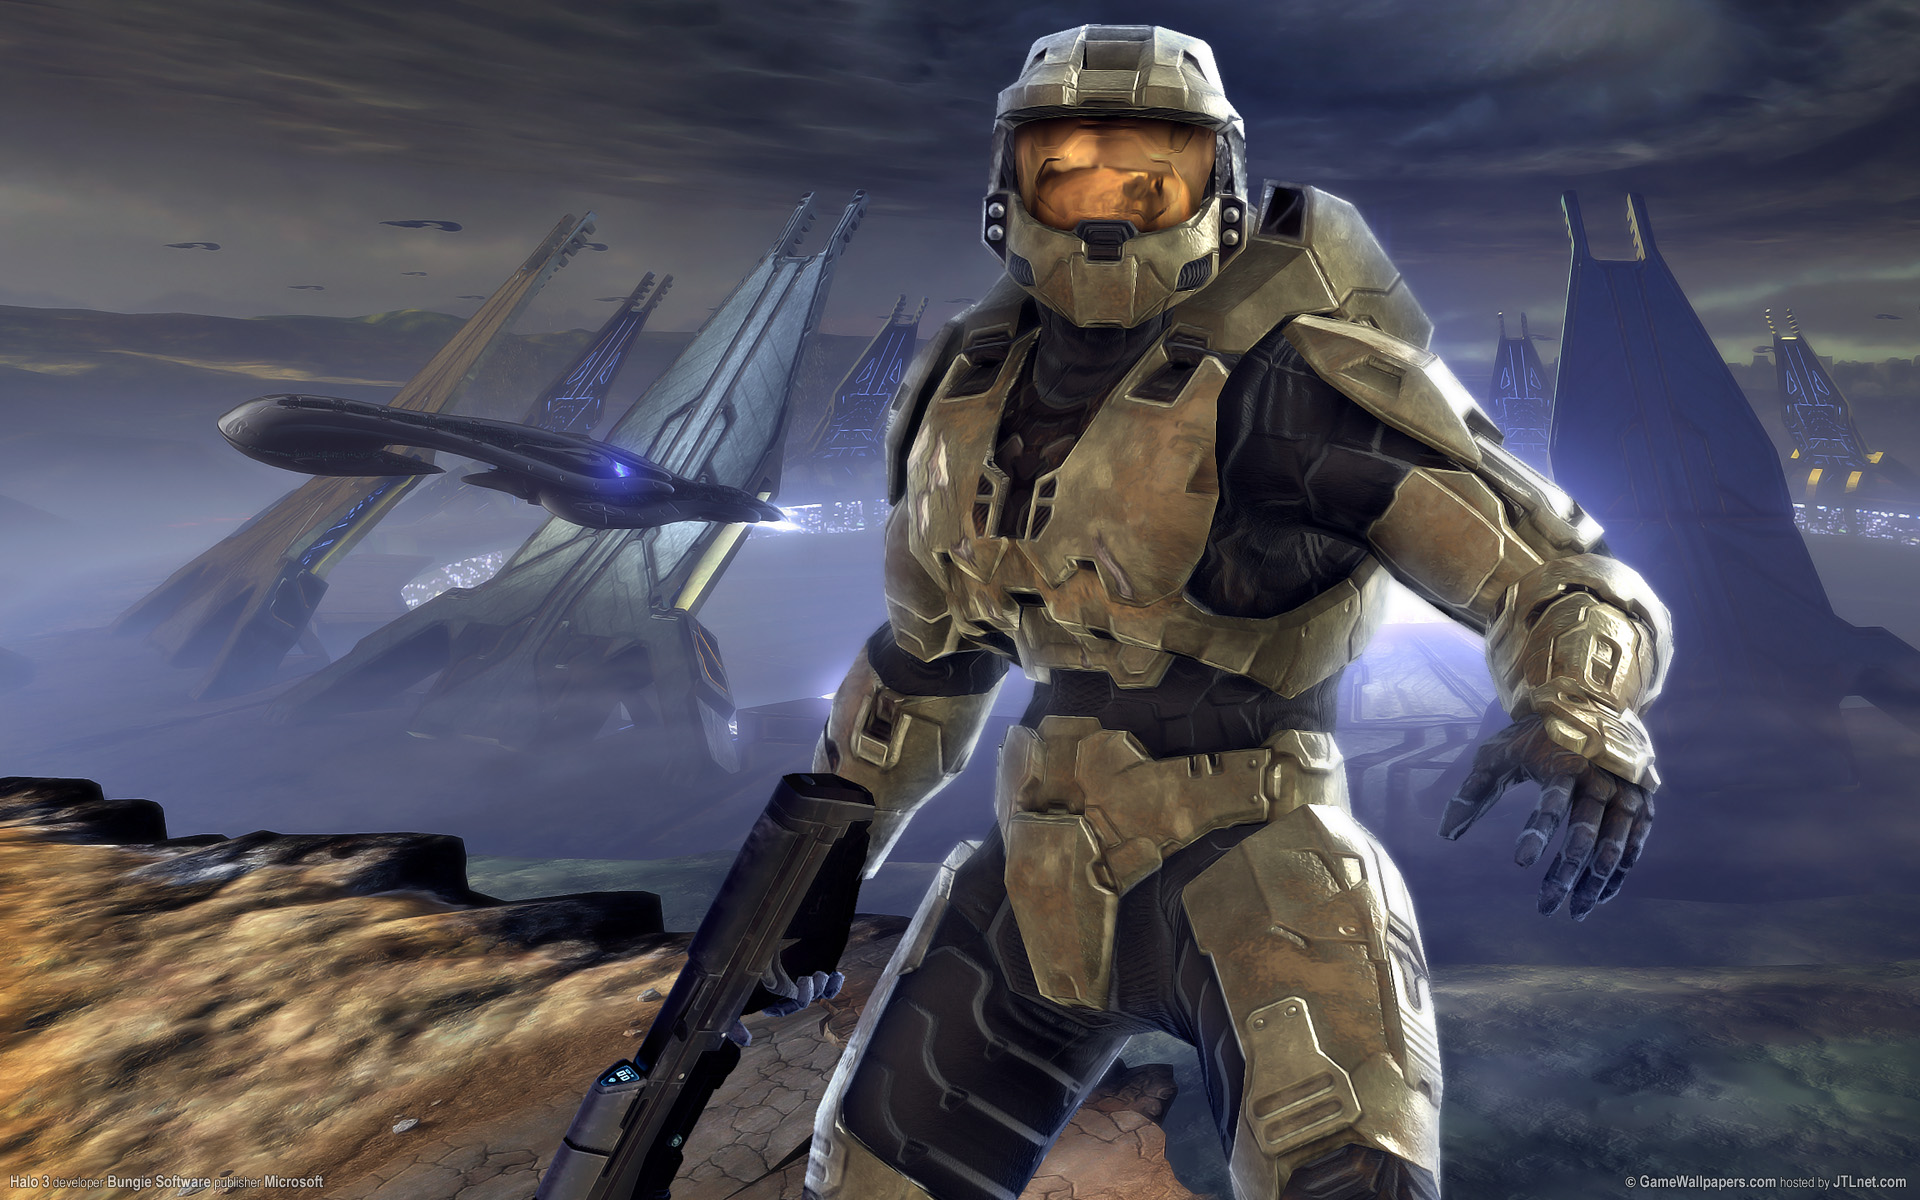 Halo 3 Wallpaper 1920x1080